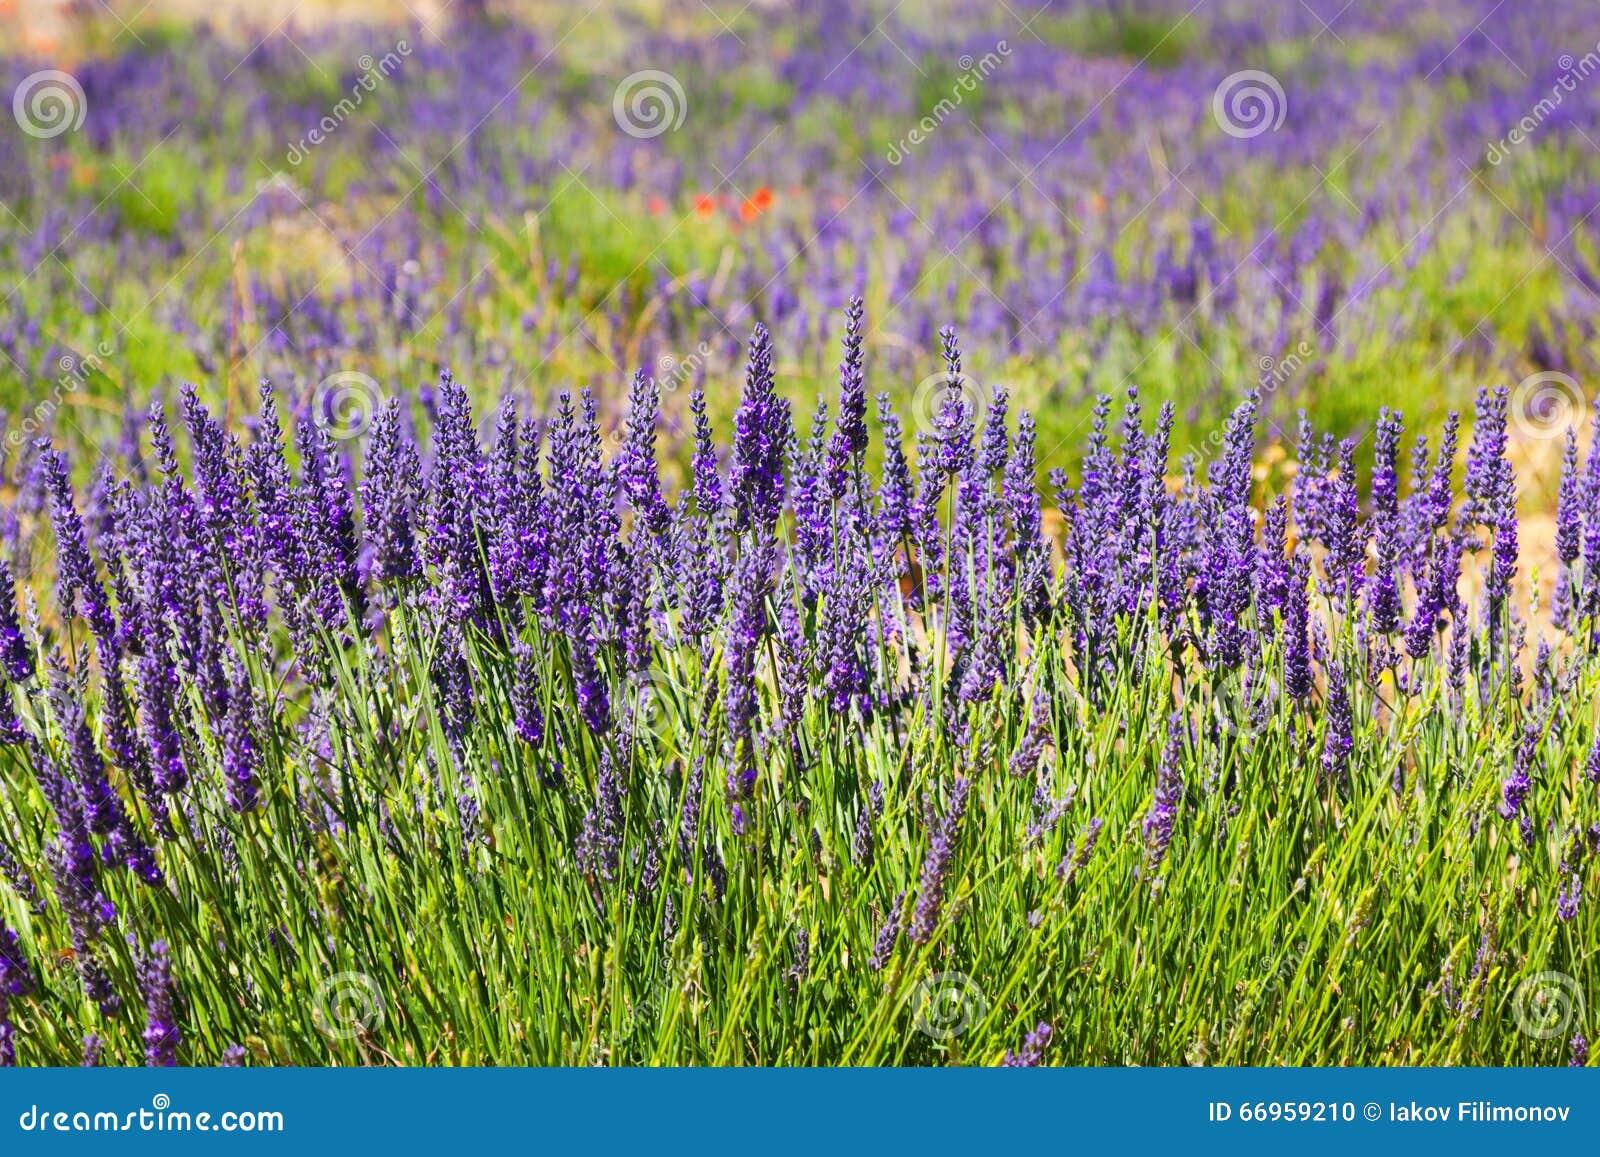 Plant of blue lavender